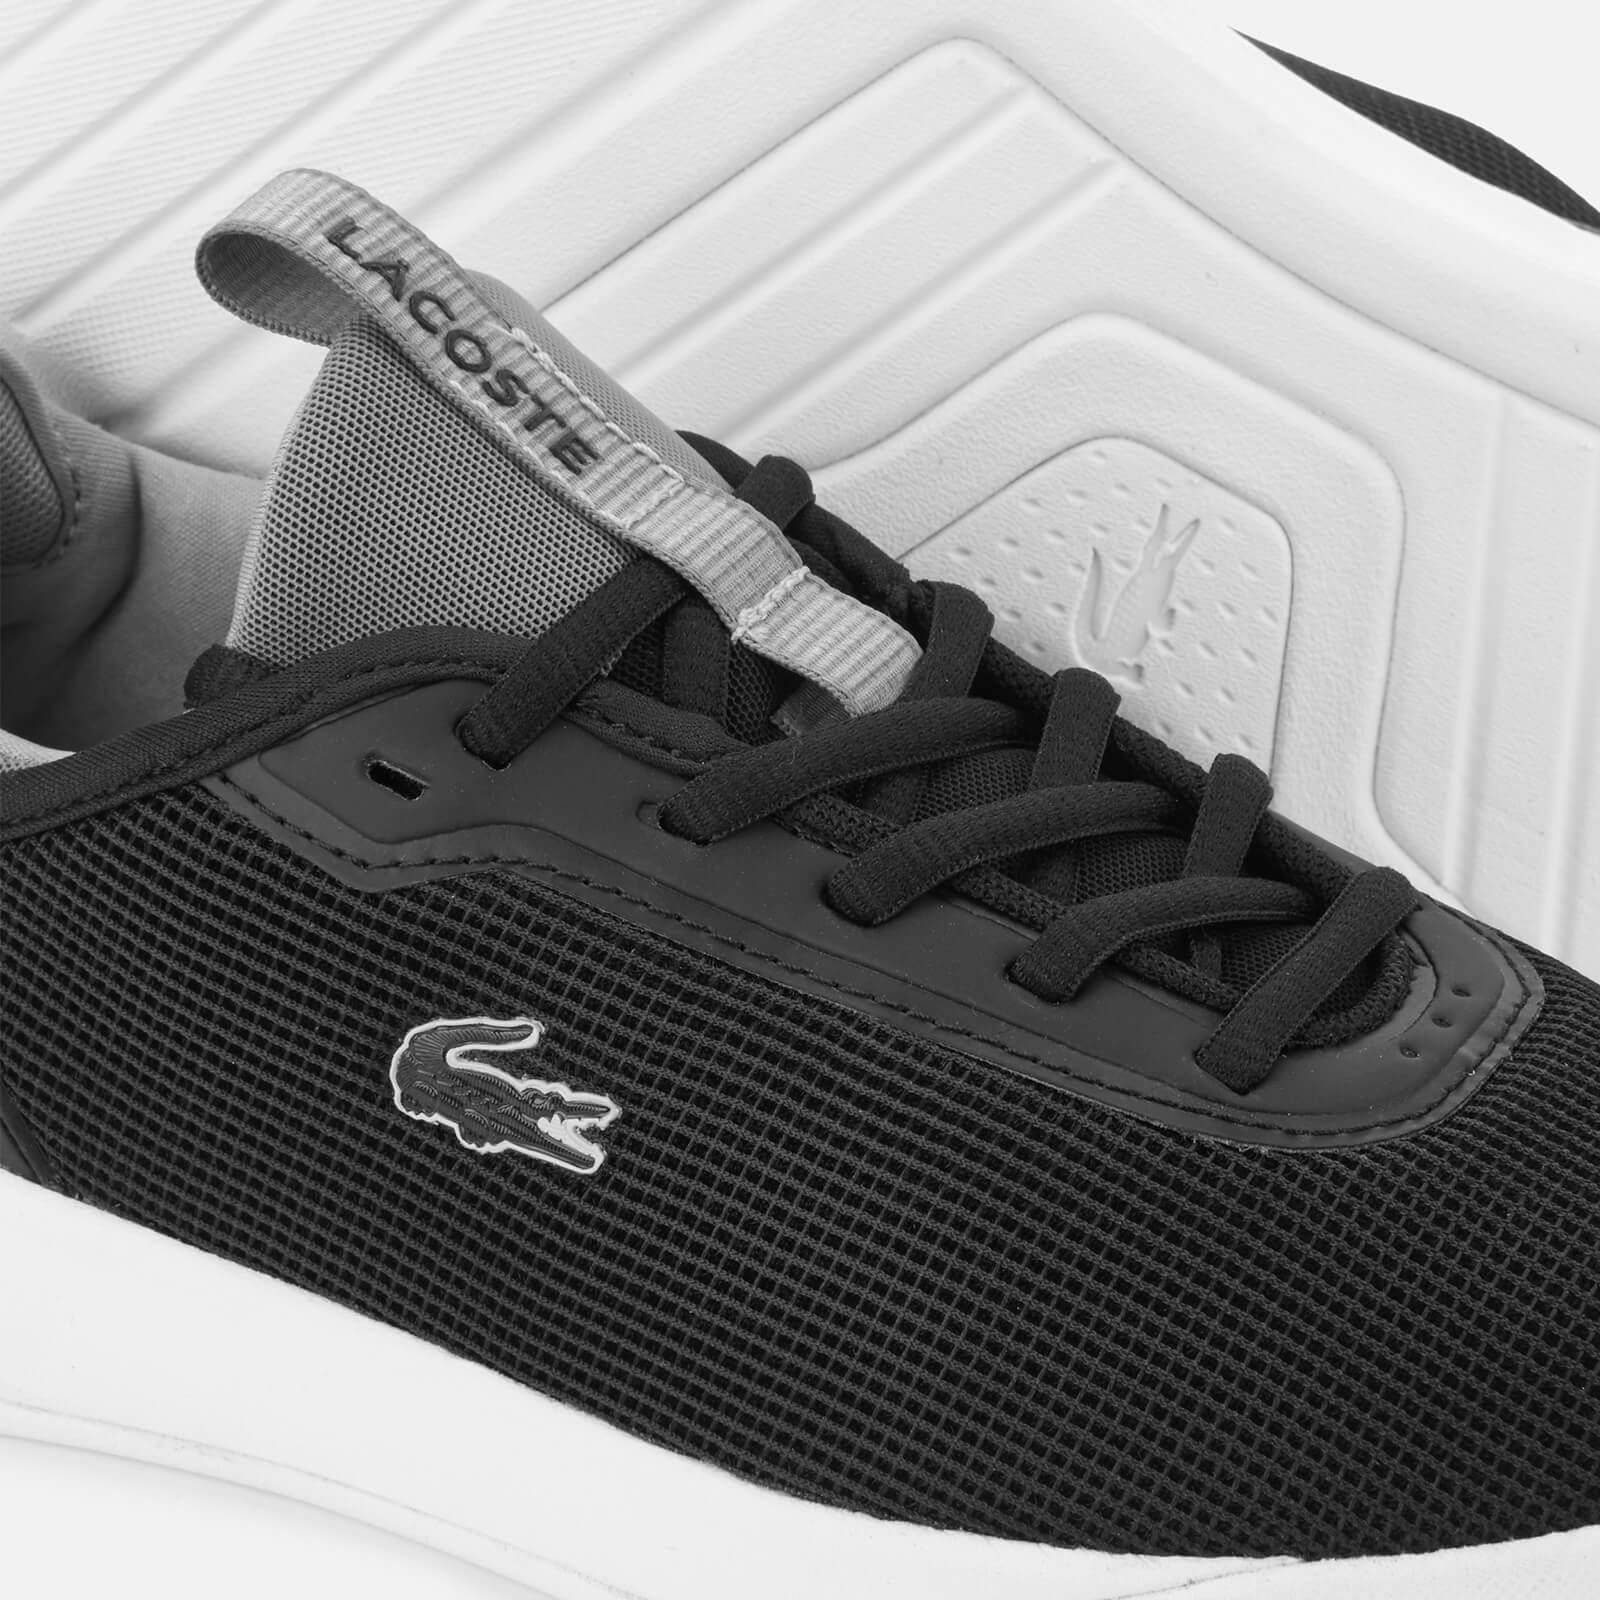 b66aa9338fa1 Lacoste - Black Lt Spirit 2.0 318 2 Textile Runner Style Trainers - Lyst.  View fullscreen